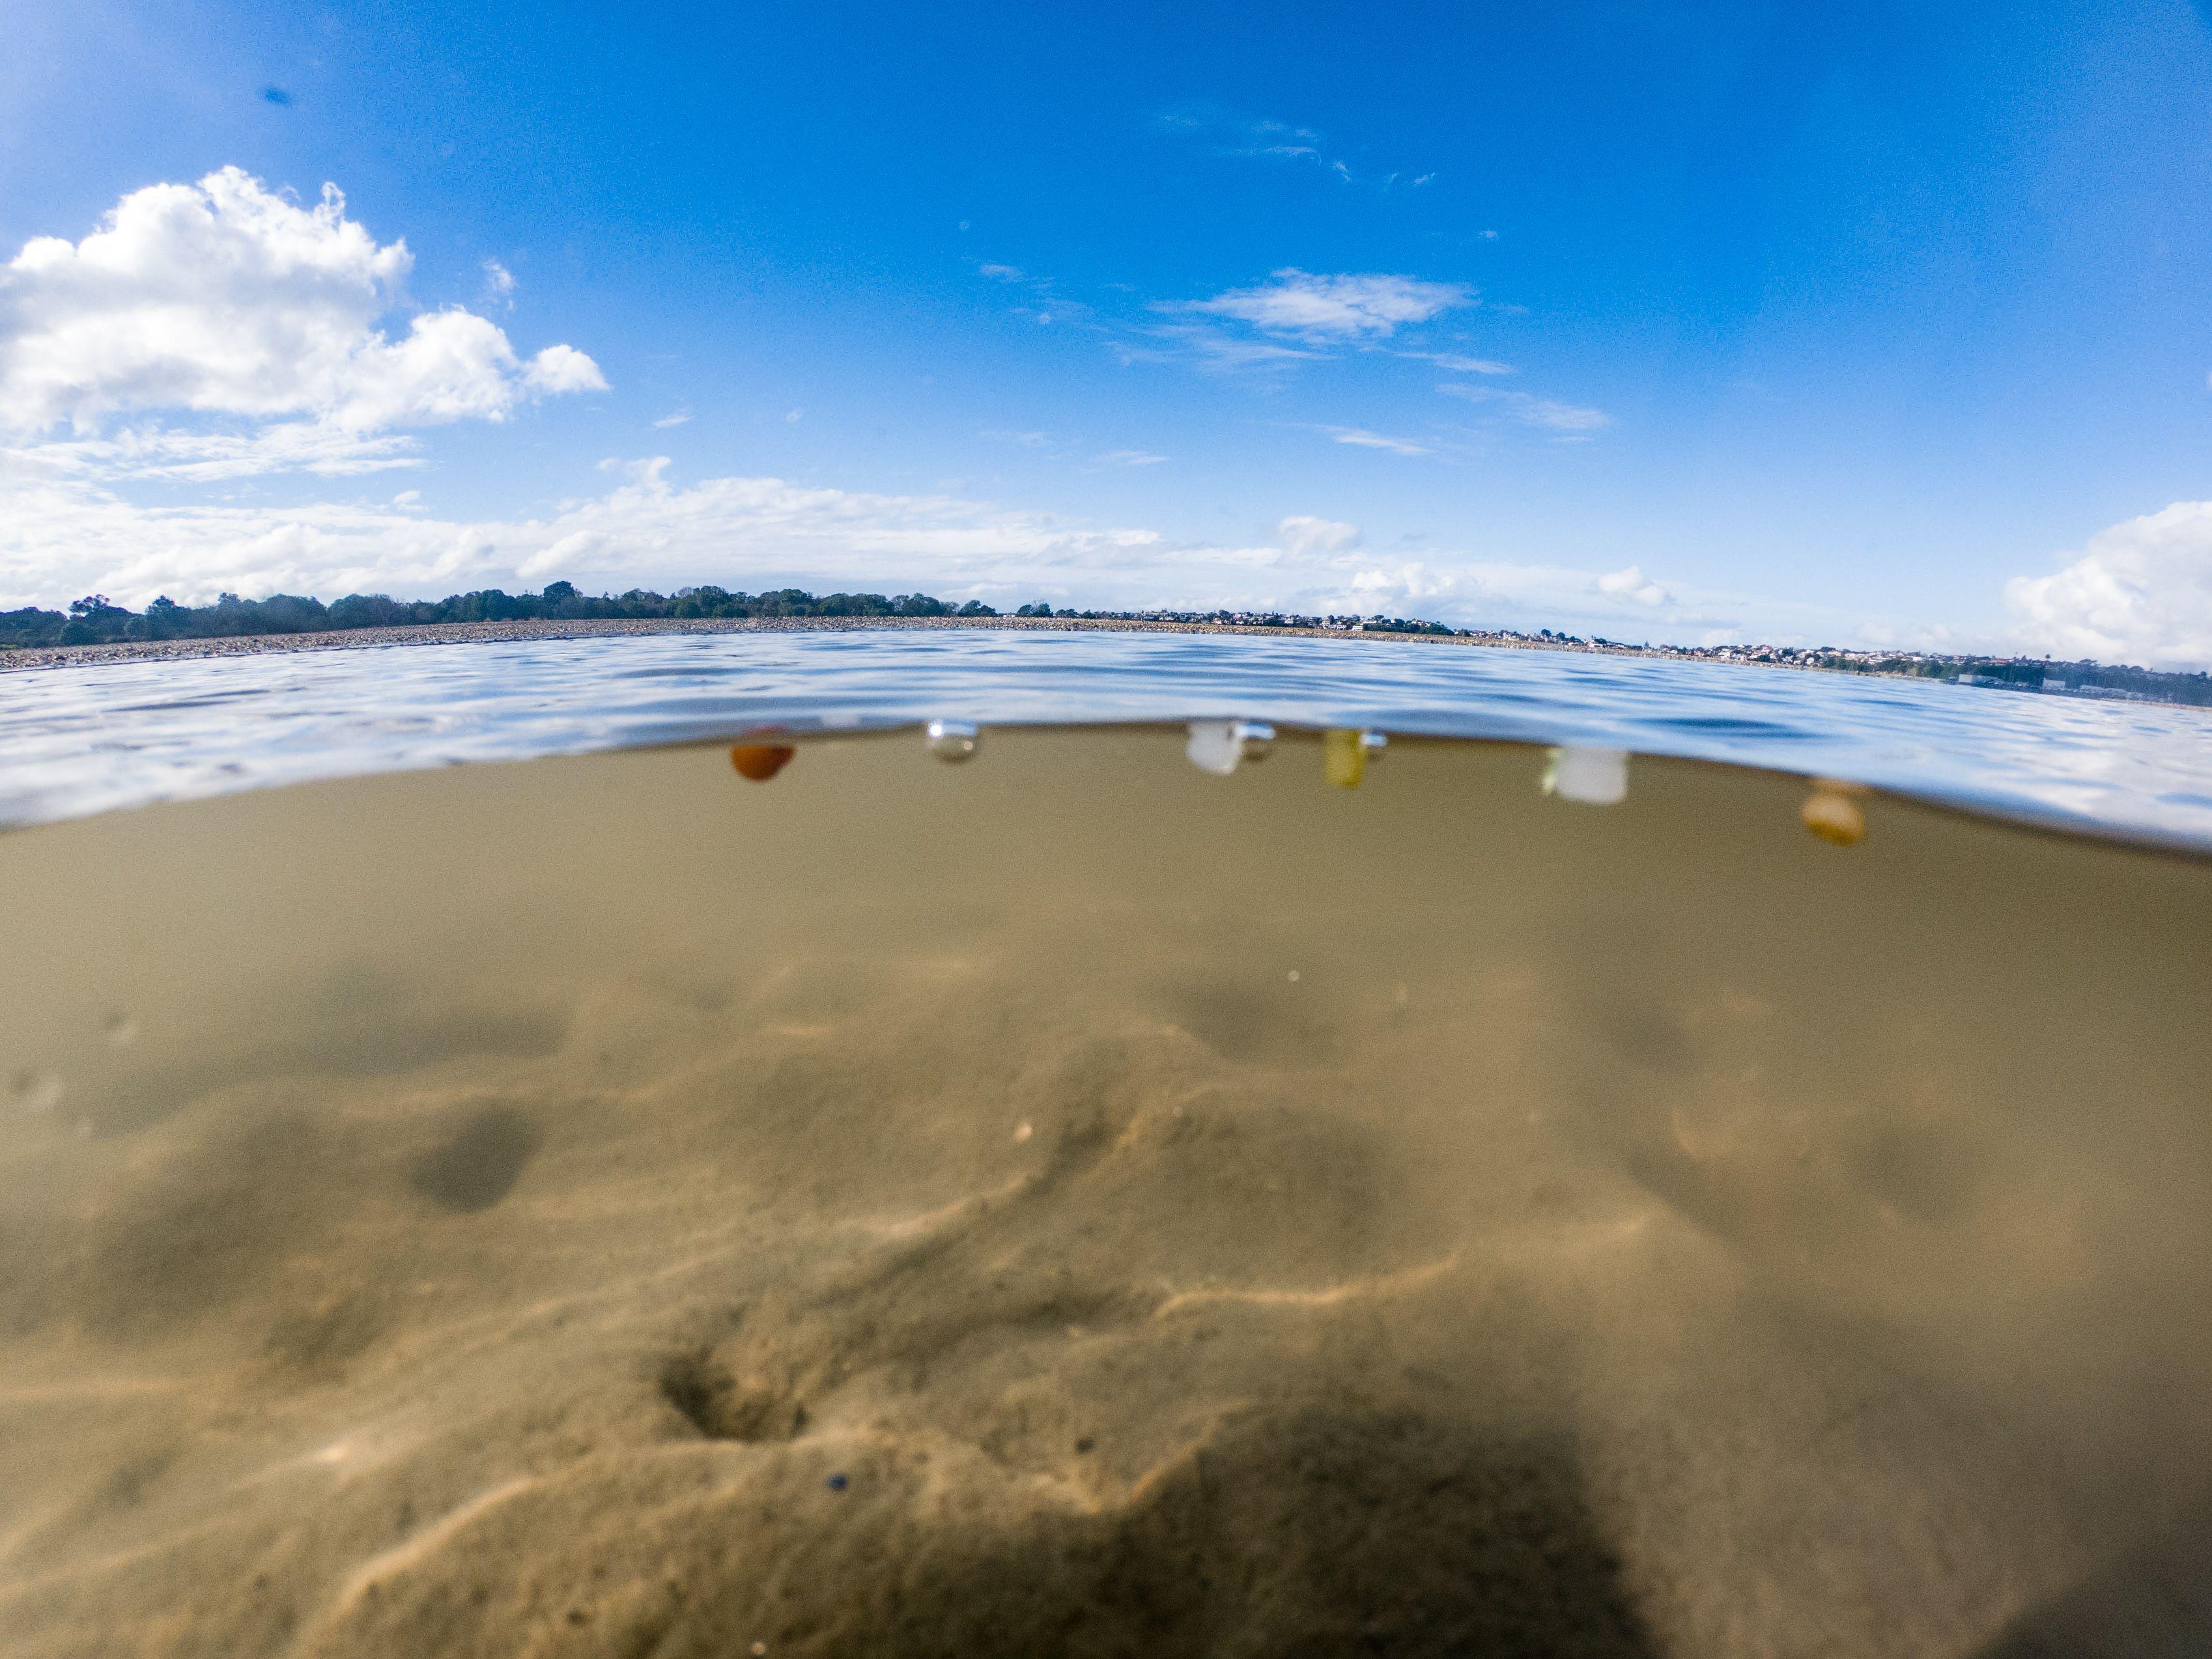 Nurdles floating in the Tamaki Estuary